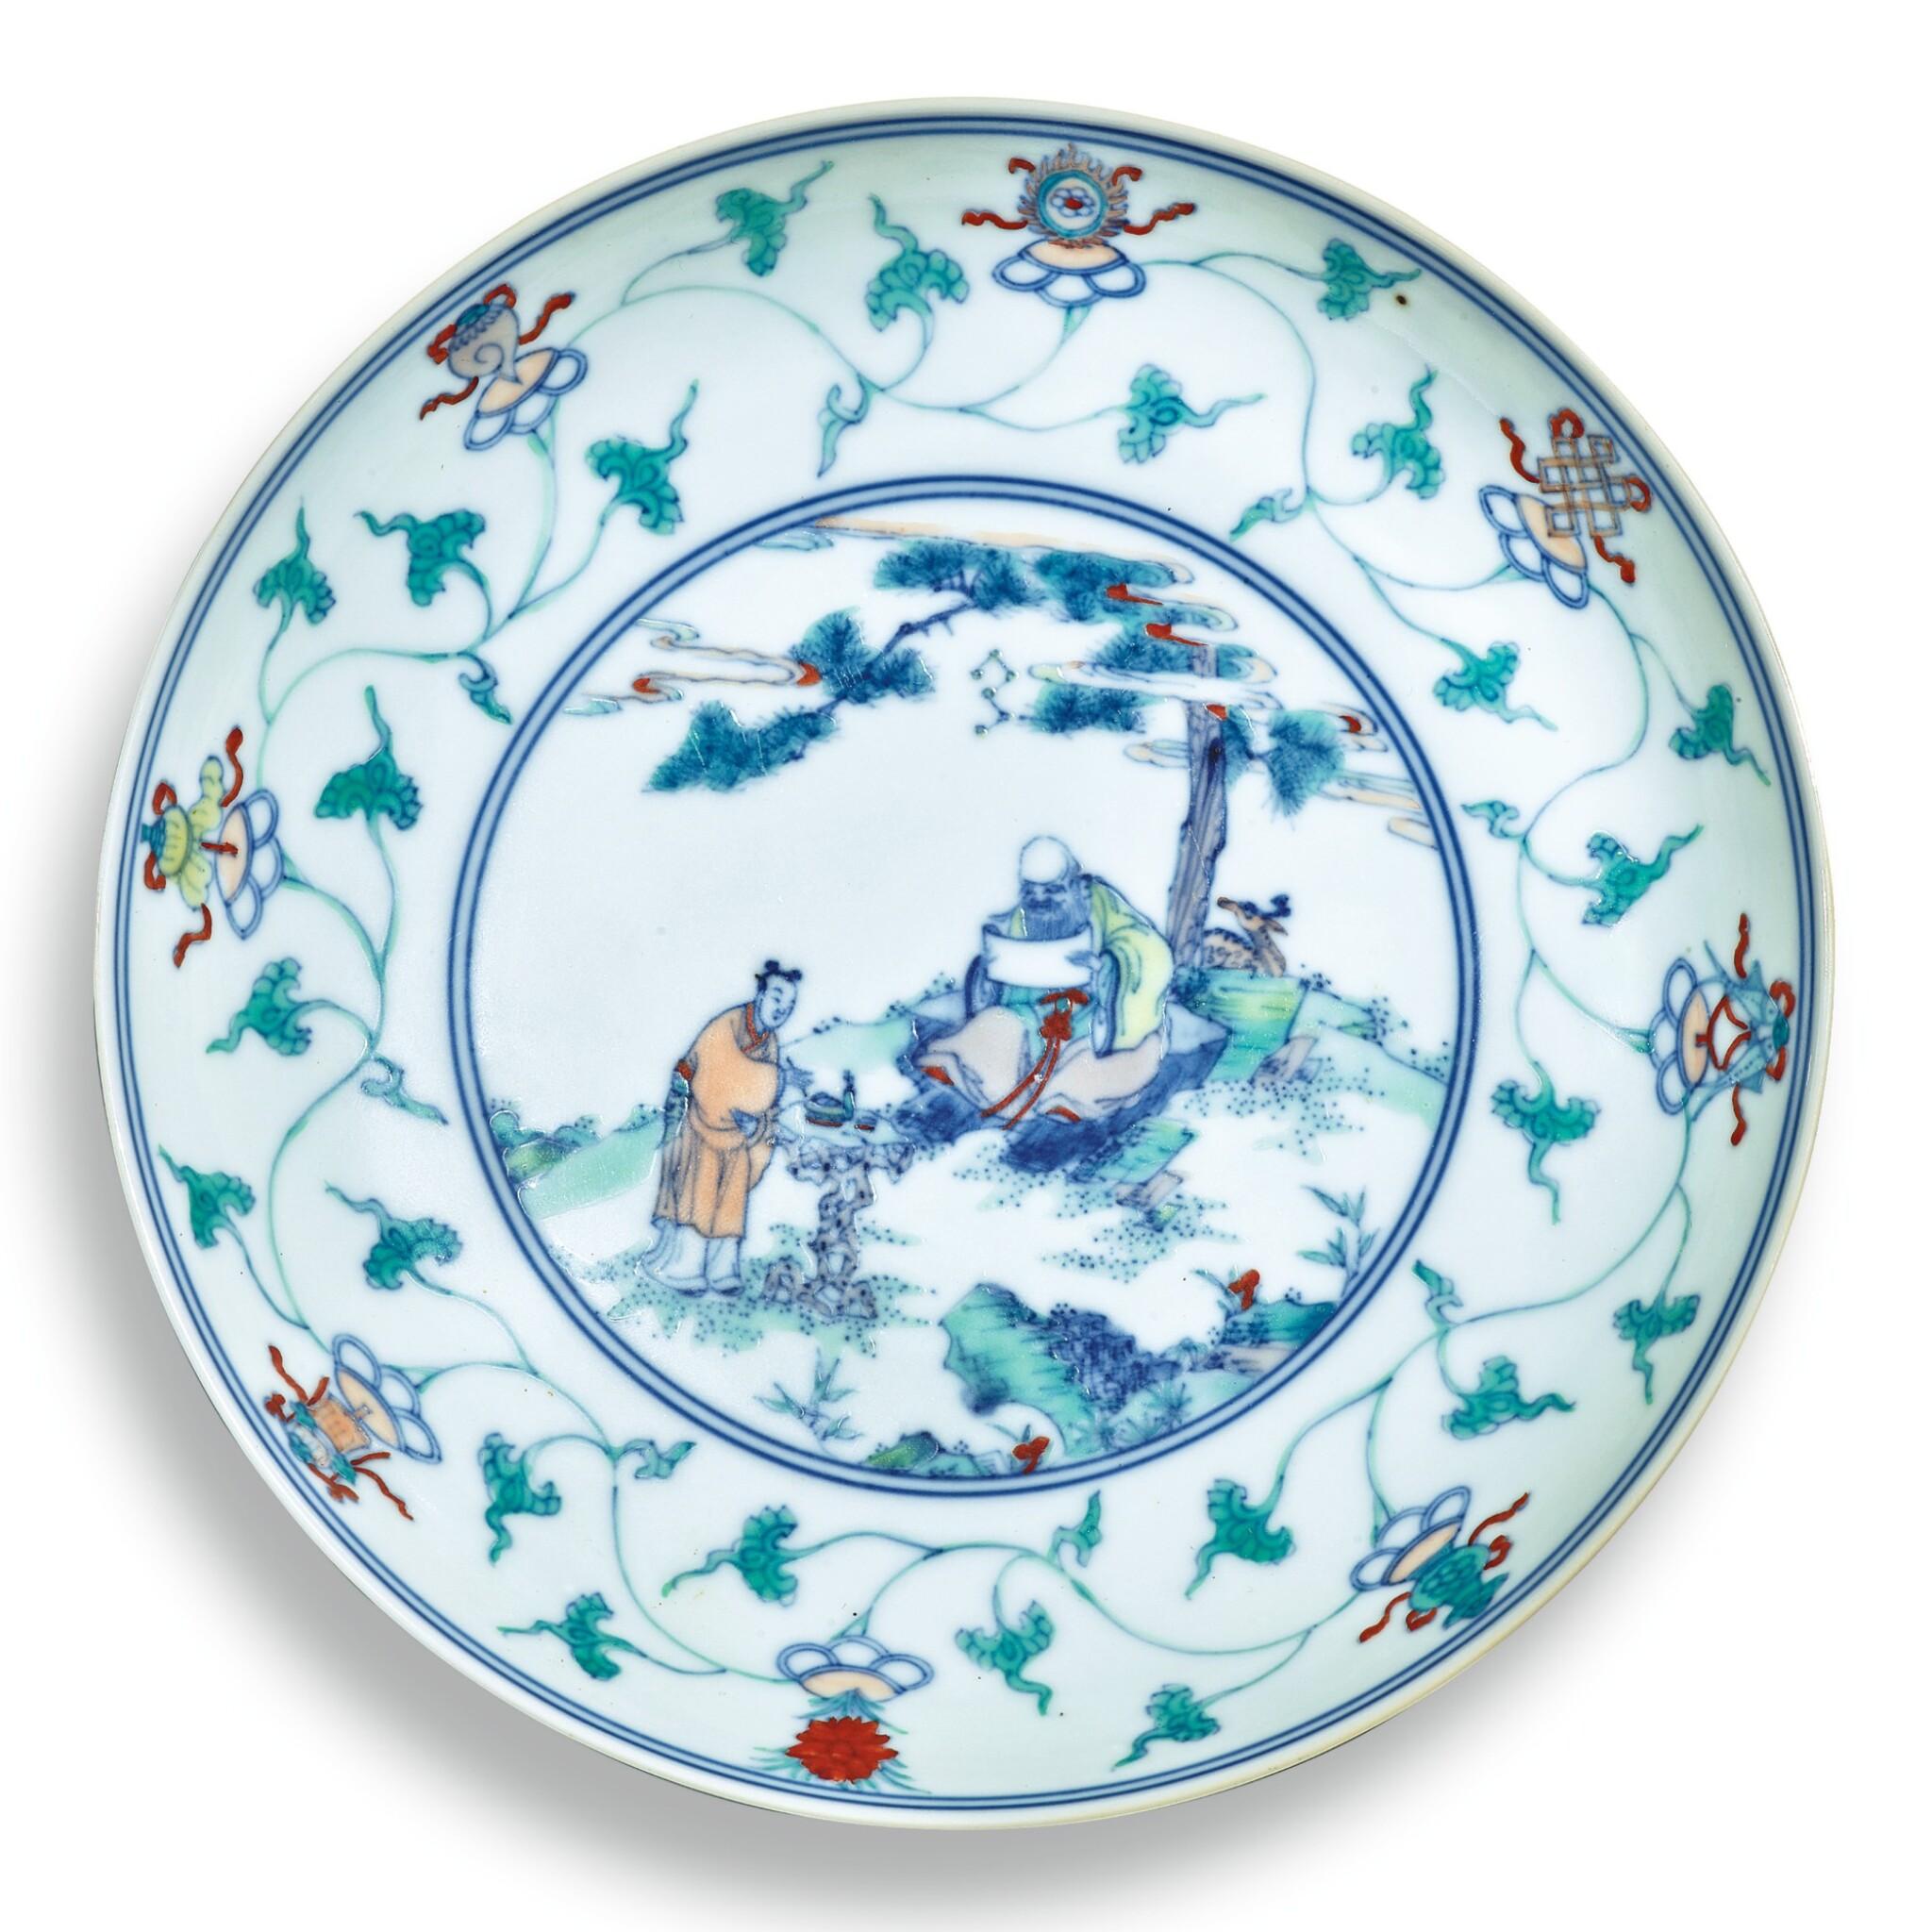 View full screen - View 1 of Lot 146. A fine and rare doucai 'immortals' dish, Qing dynasty, Kangxi / Yongzheng period | 清康熙 / 雍正 鬥彩壽老觀卷圖盤.